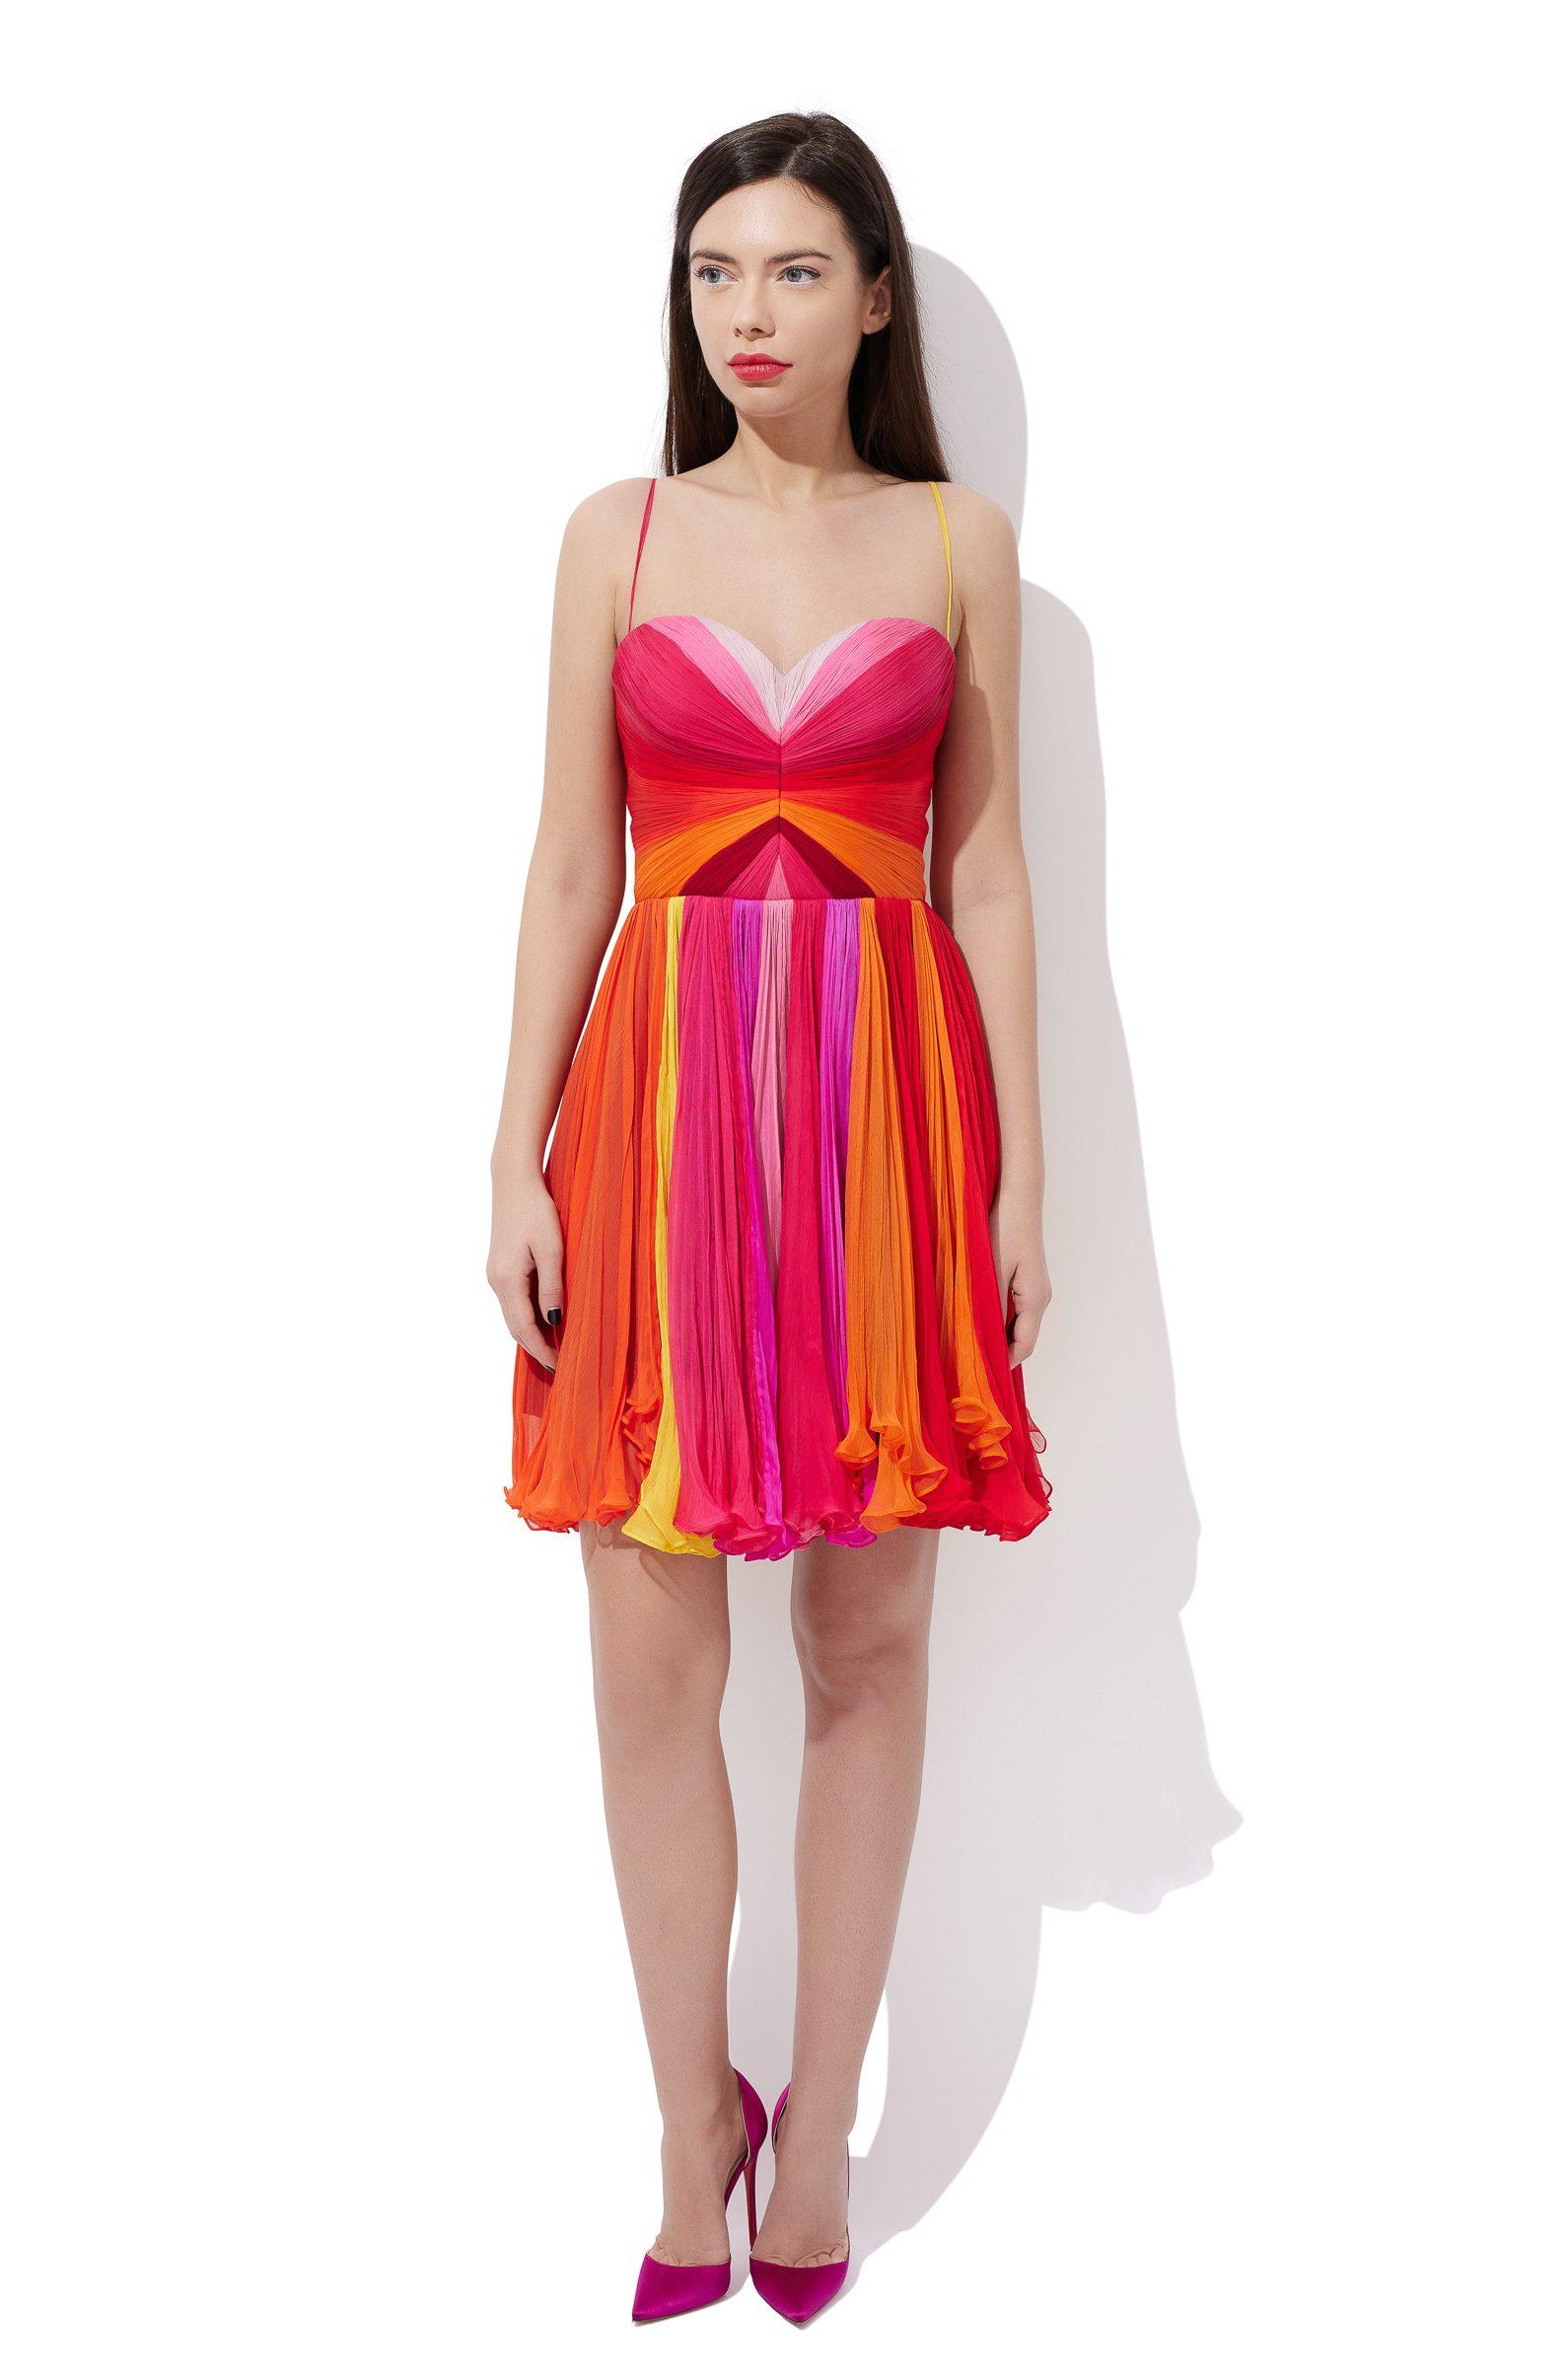 Multicolored corset cocktail dress